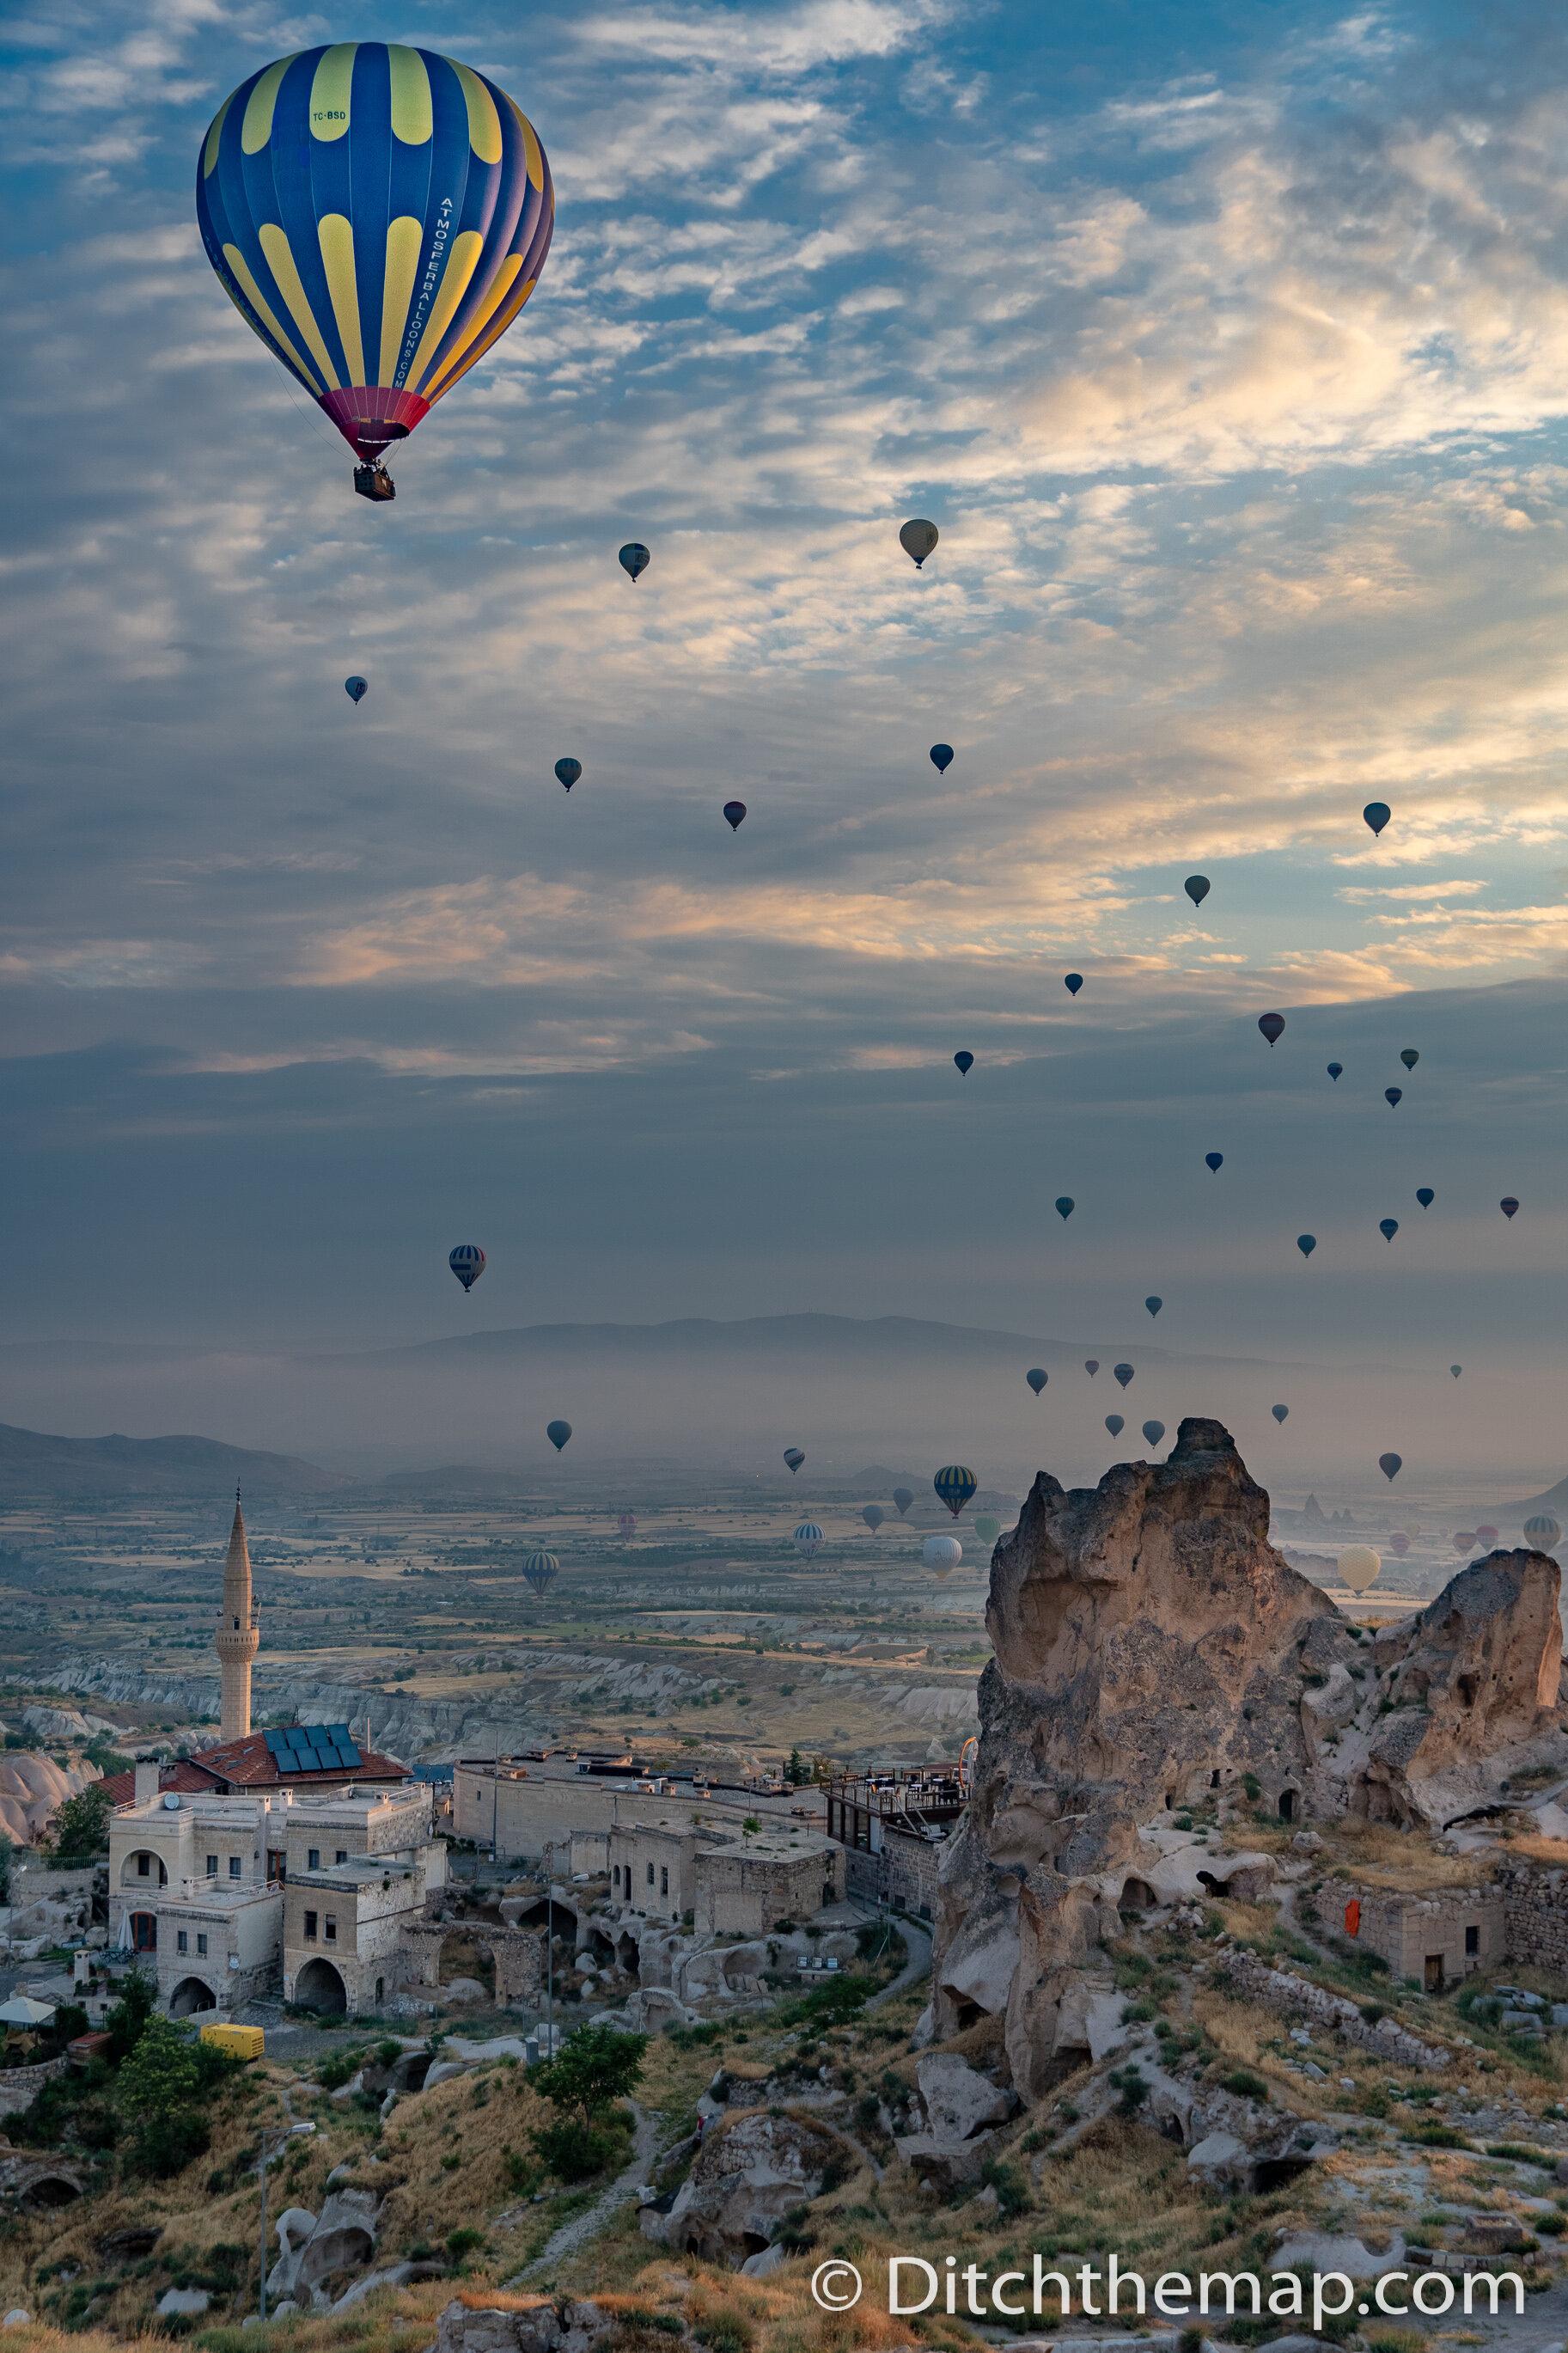 Watching the hot air balloons in Cappadocia